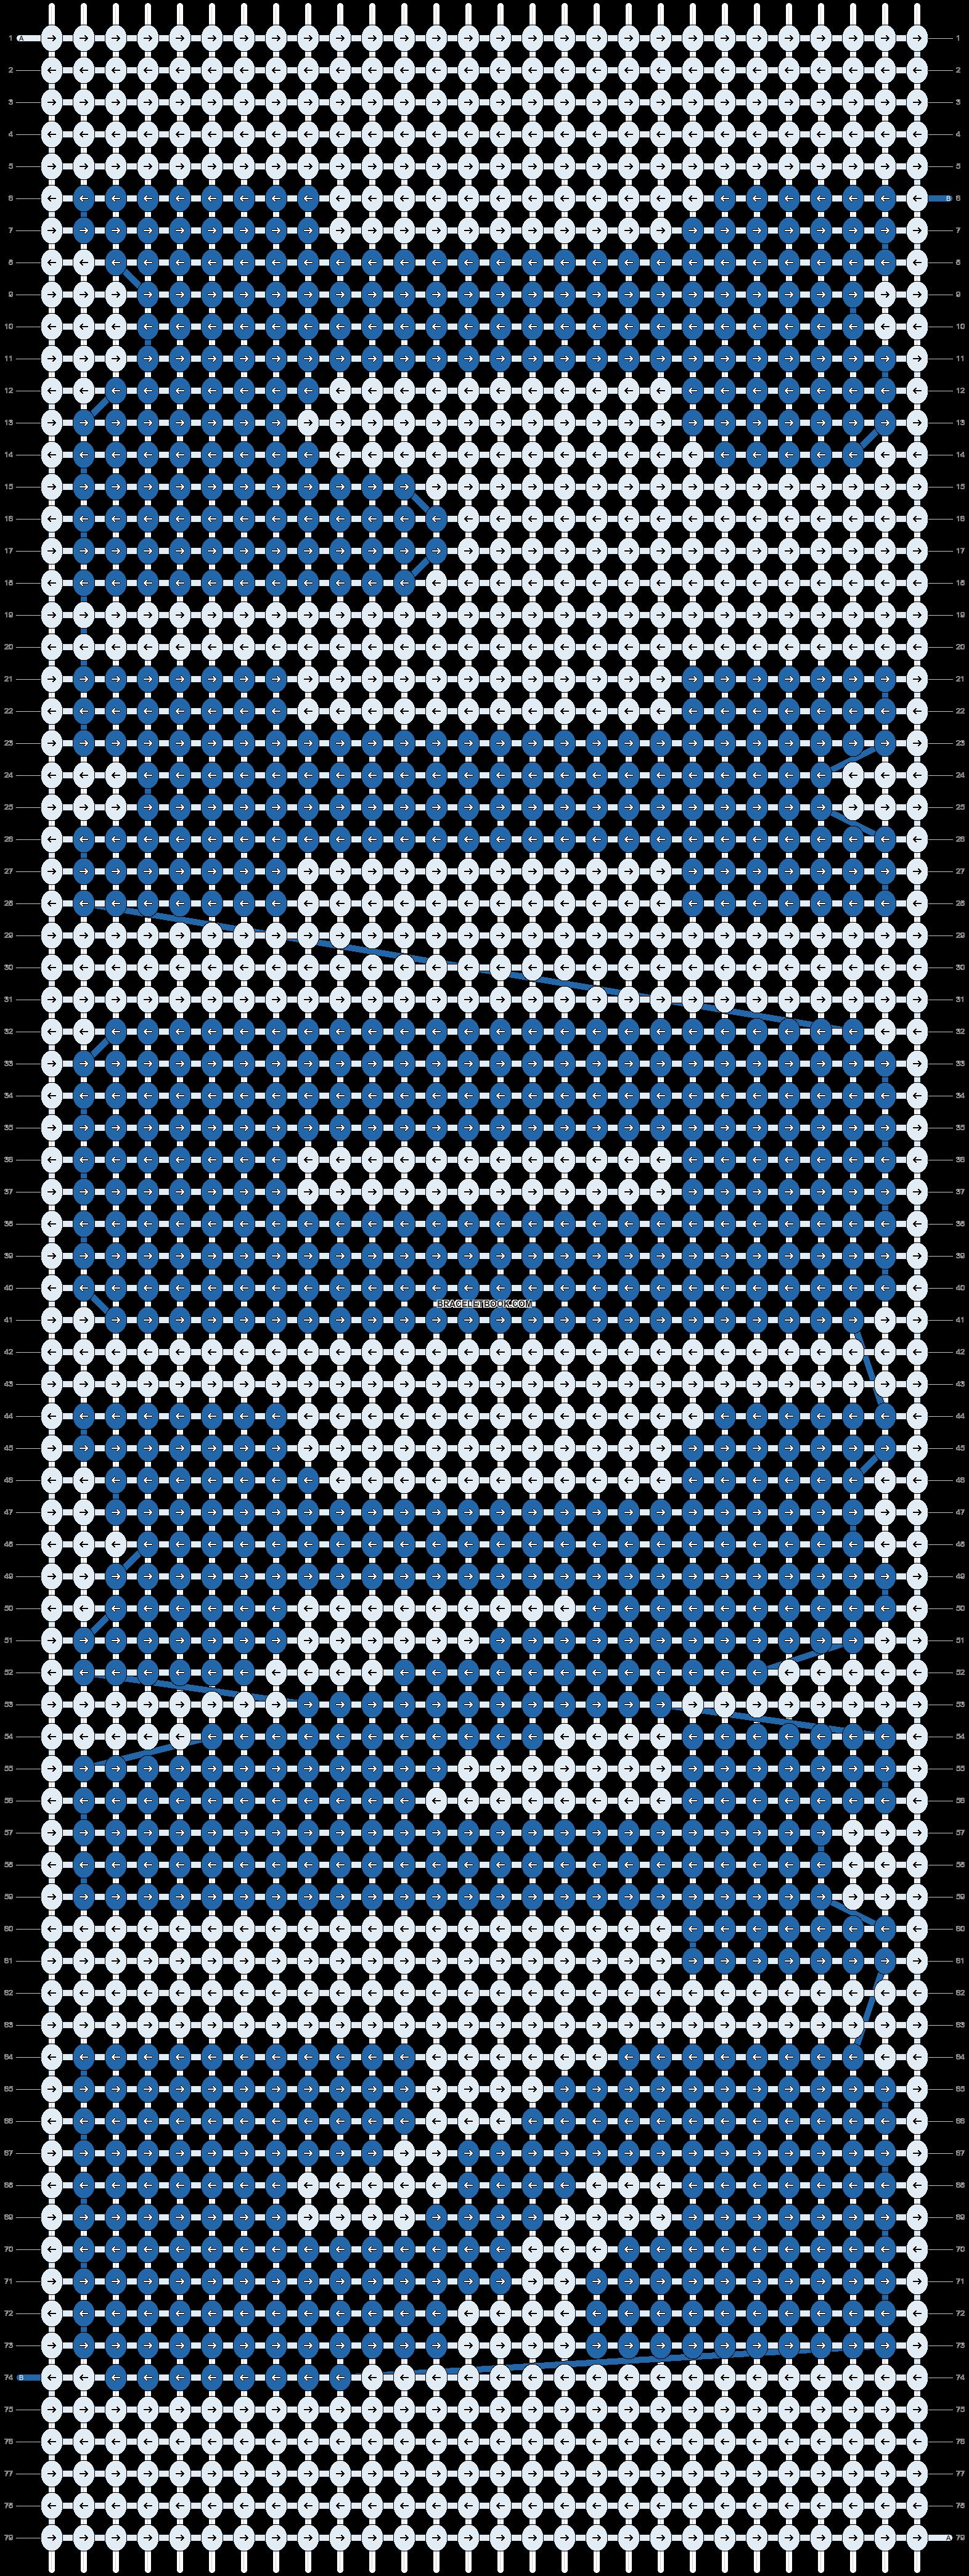 Alpha Pattern #6742 added by marinewife